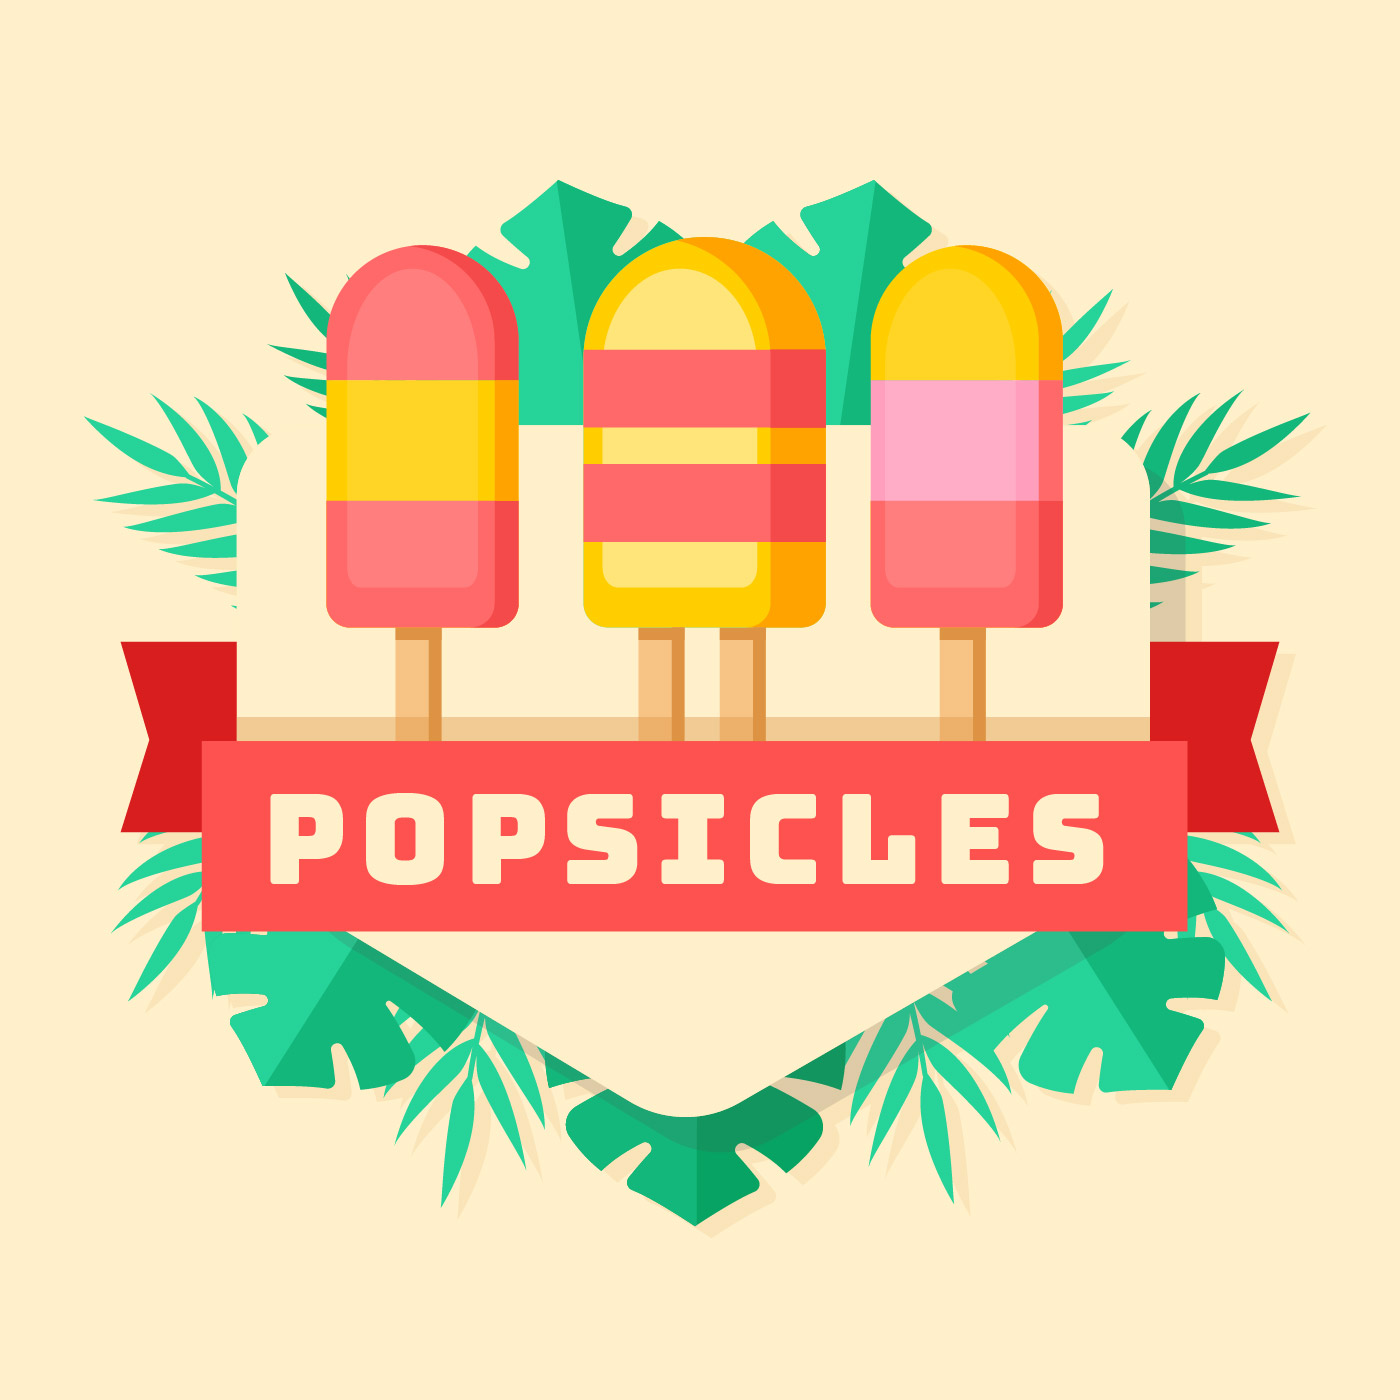 Fresh Ice Cream Stick In Summer Wallpaper Vector: Summer Popsicles Ice Cream Background